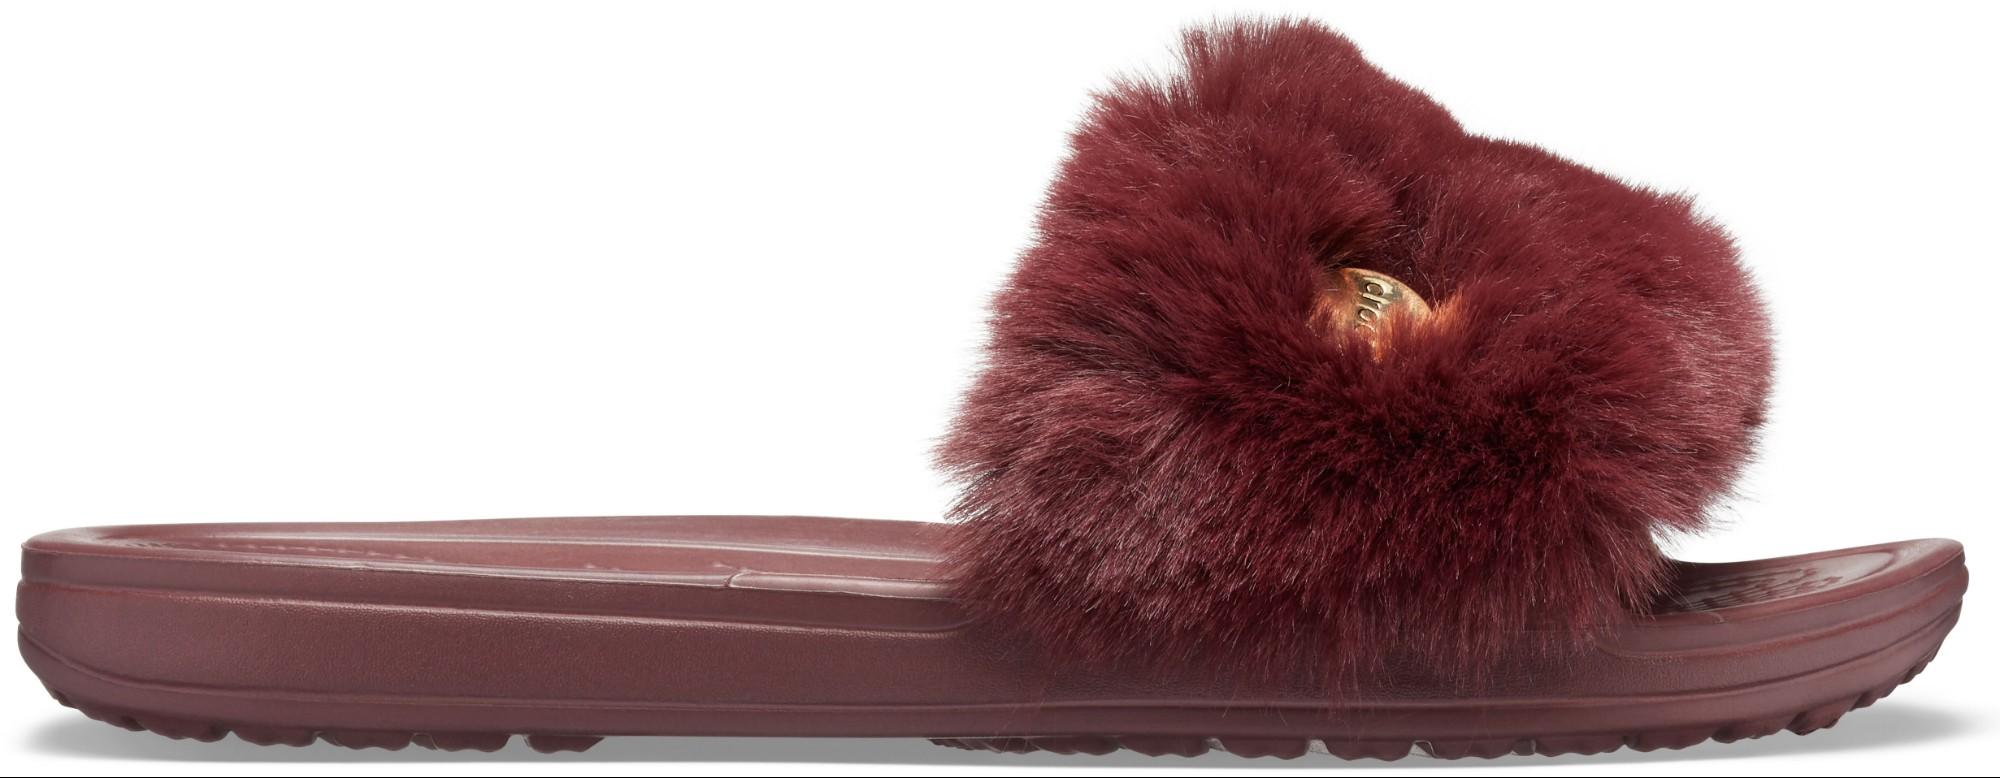 Crocs™ Crocs Sloane Luxe Slide Women's Burgundy/Burgundy 37,5